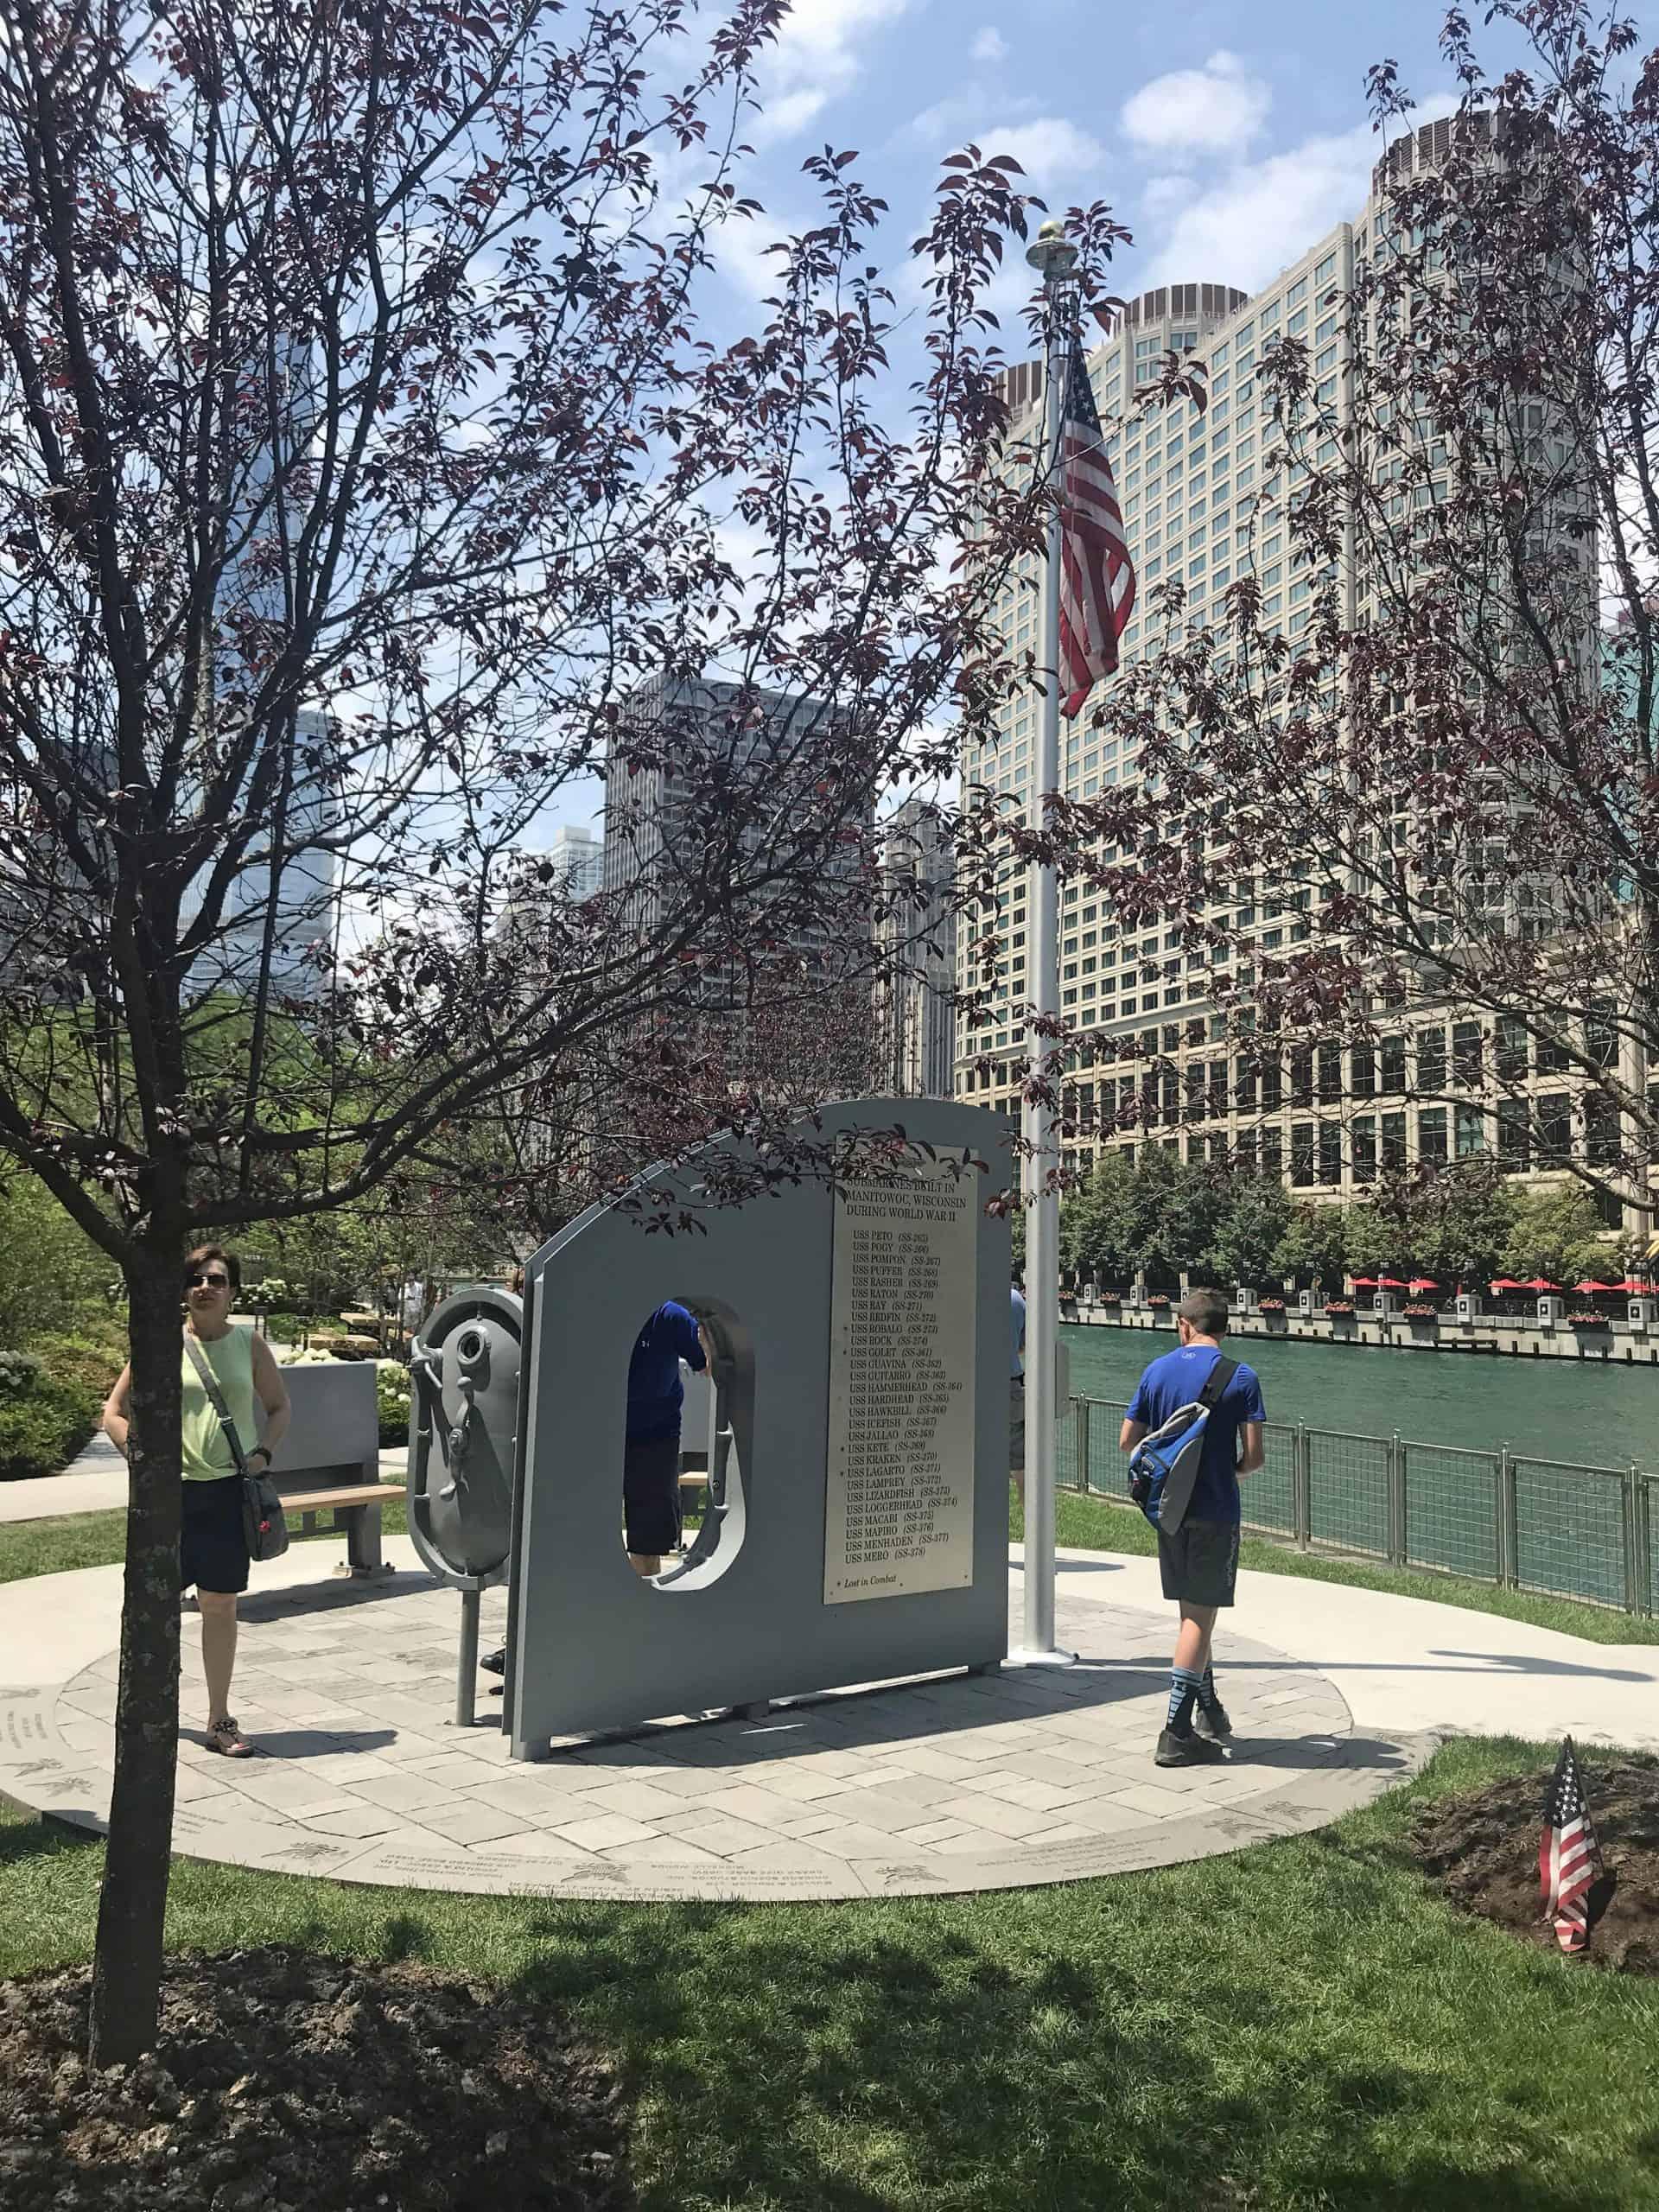 chicagoriverwalk_Point 5.3 Directly across River from Centennial Fountain